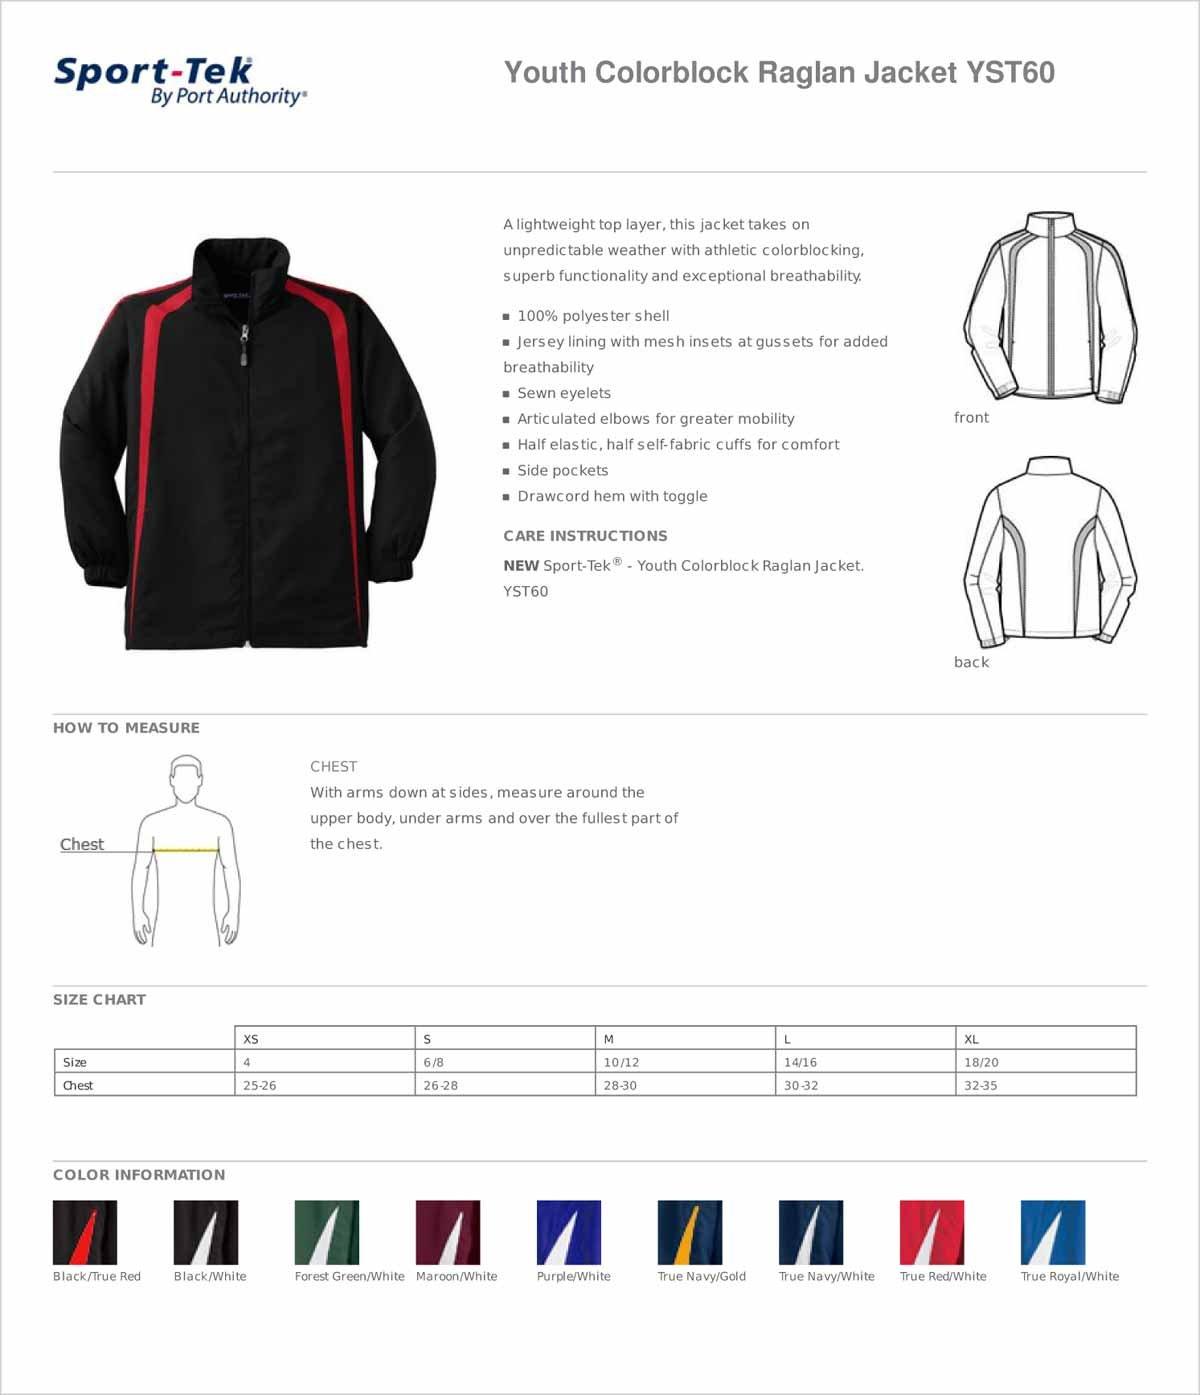 Sport-Tek YST60 Youth Colorblock Raglan Jacket